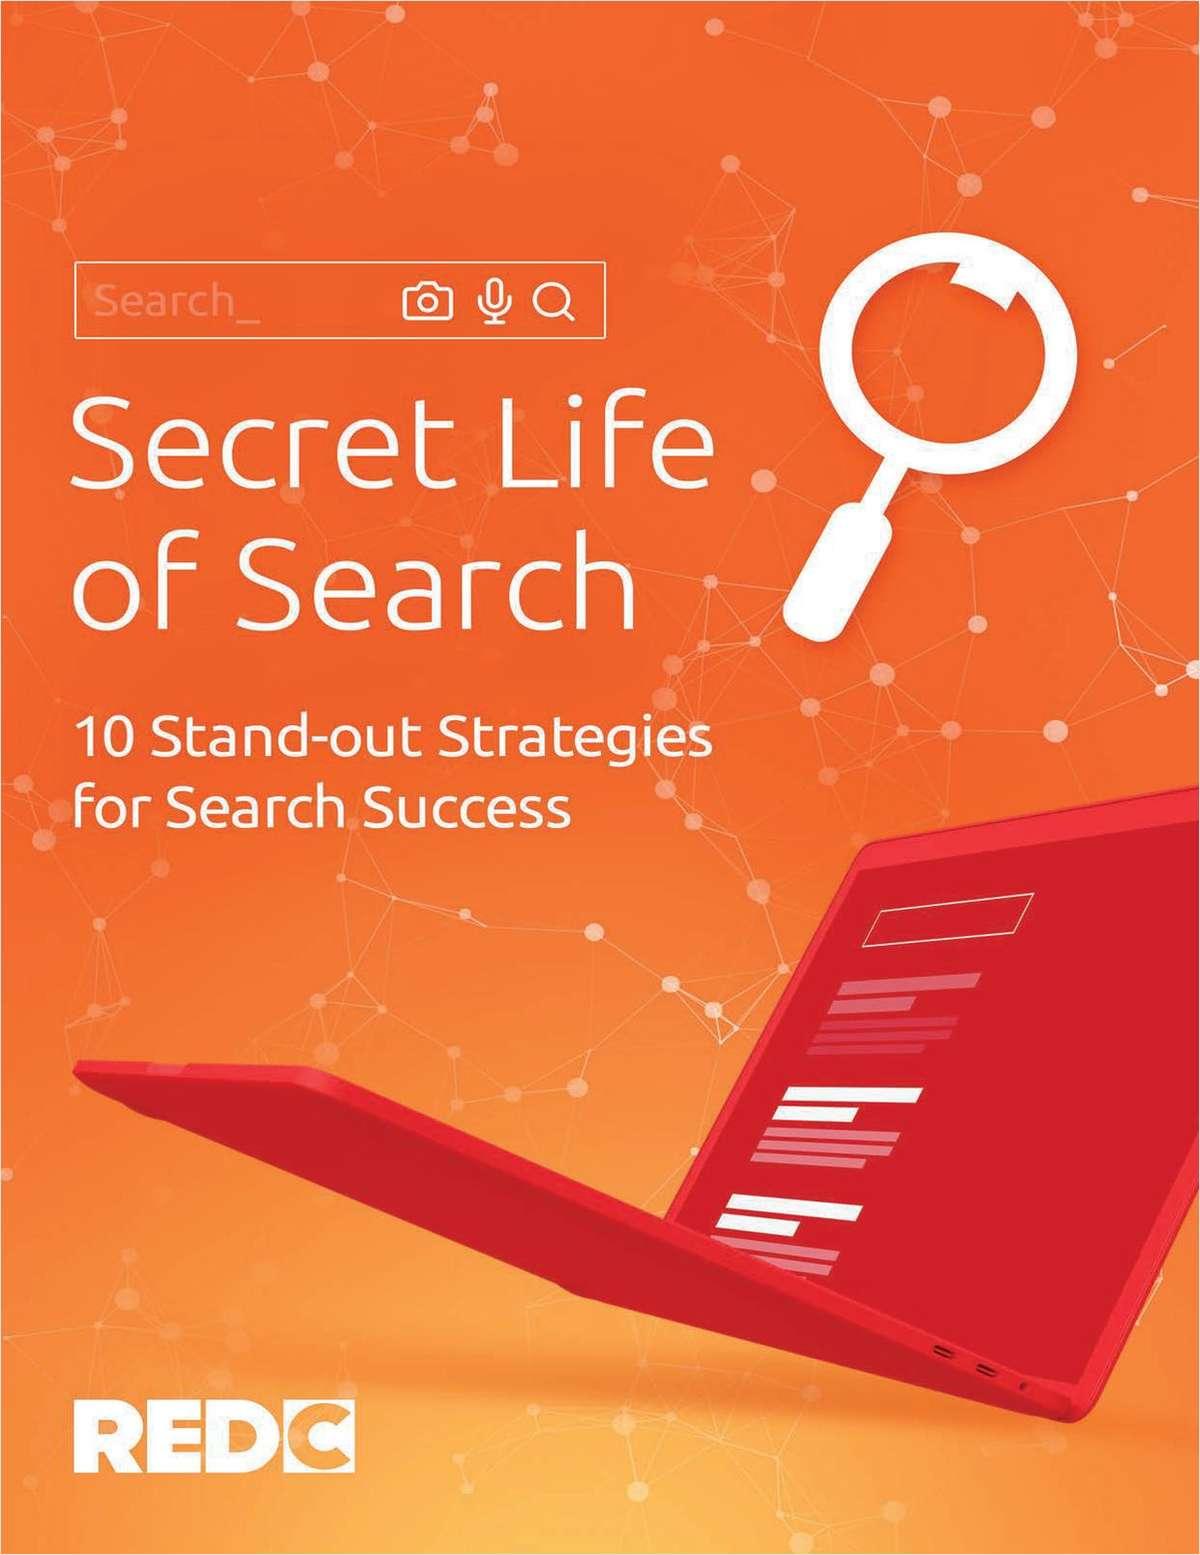 Secret Life of Search